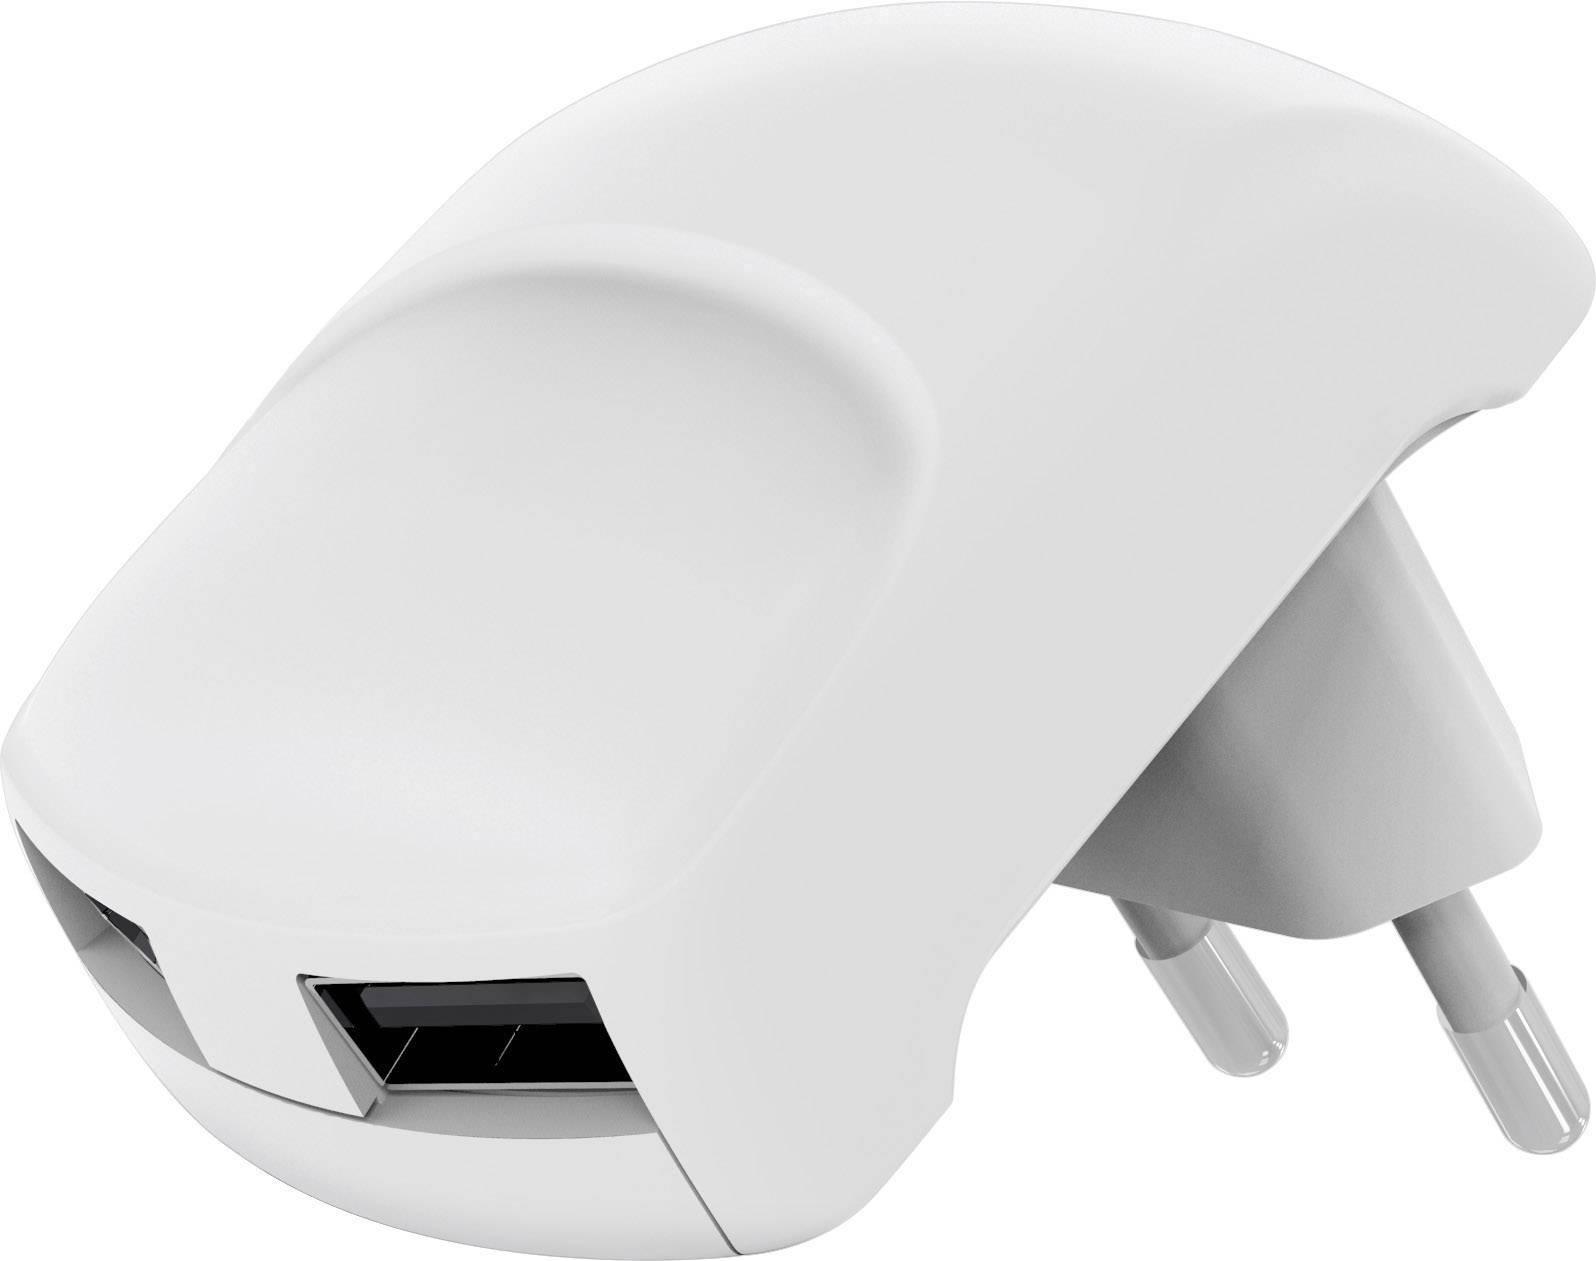 USB nabíječka Goobay 59234, 2400 mA, bílá